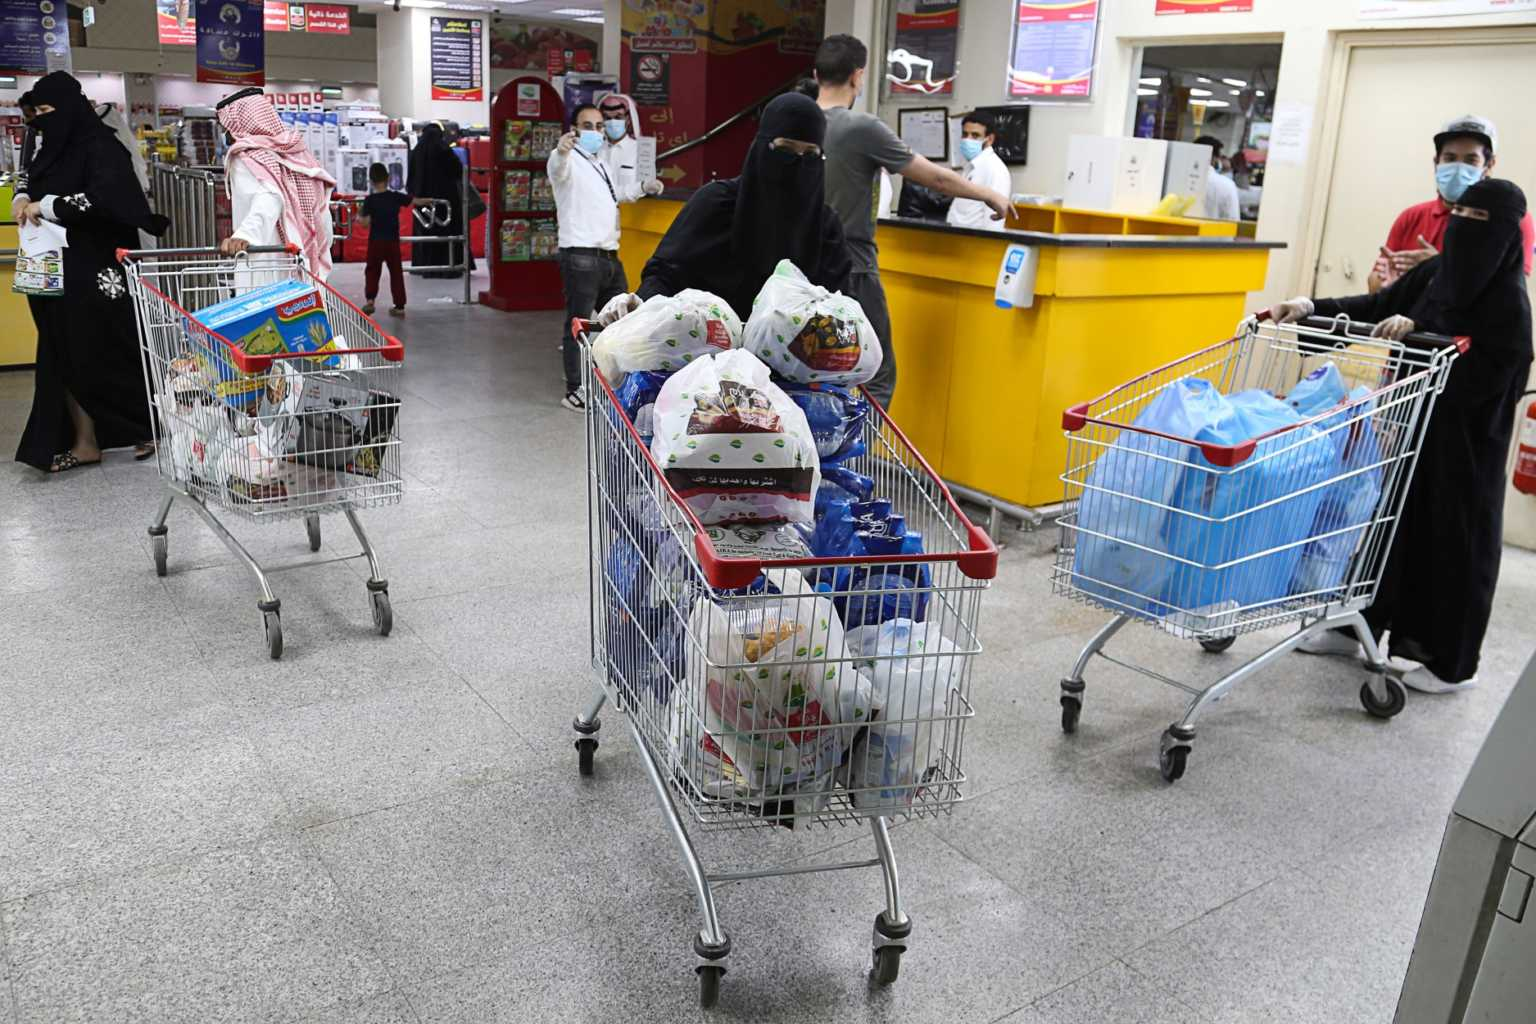 Saudi_Arabia_supermarket_01_07_2020-1536x1024